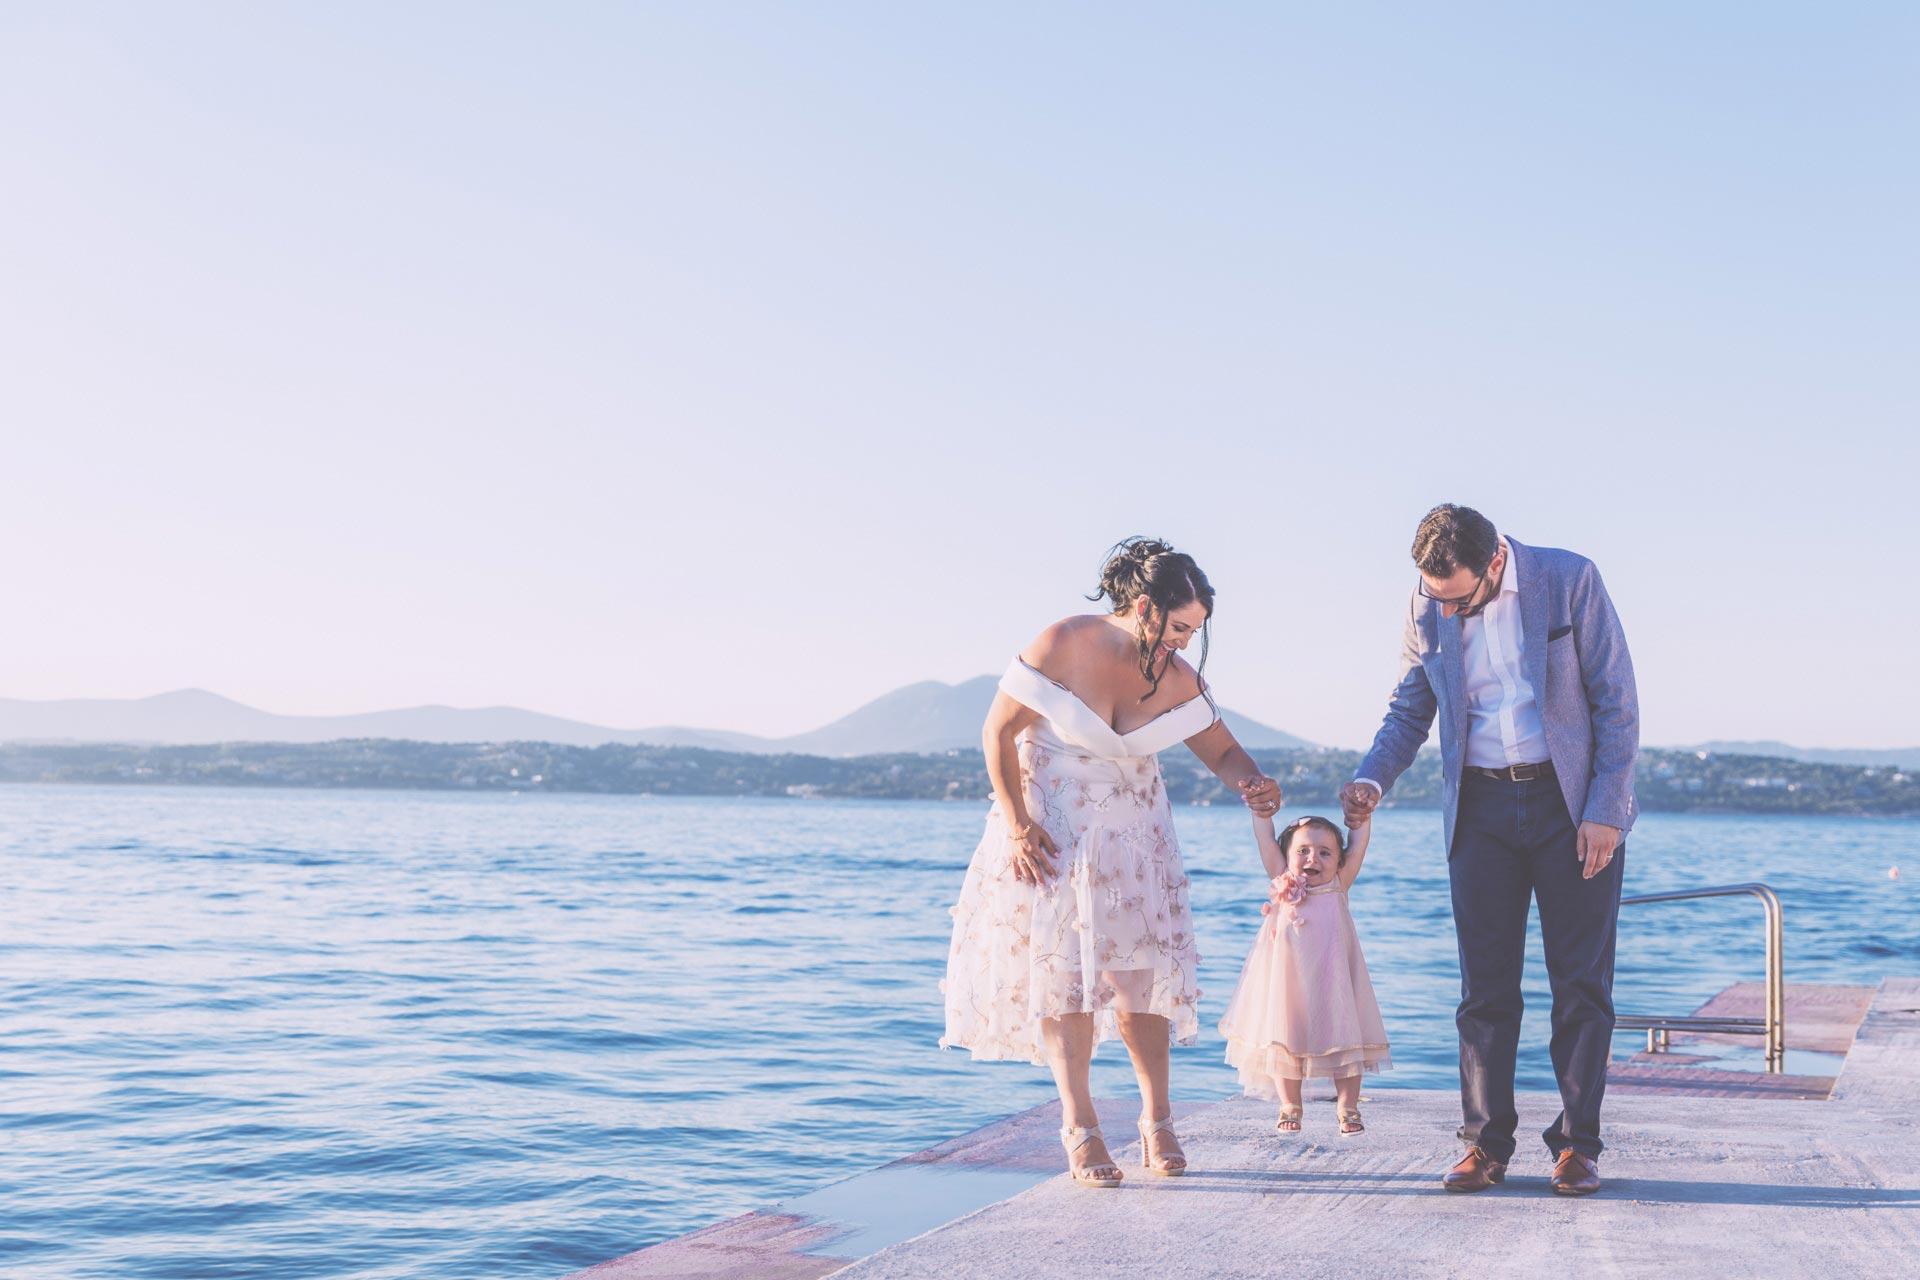 076 PhotoVaptisis Spetses vaptisi βαπτιση μωρο βαπτιστικά βαπριση σπετσες αγιος μαμας διακοσμηση βάπτισης γονείς νονά